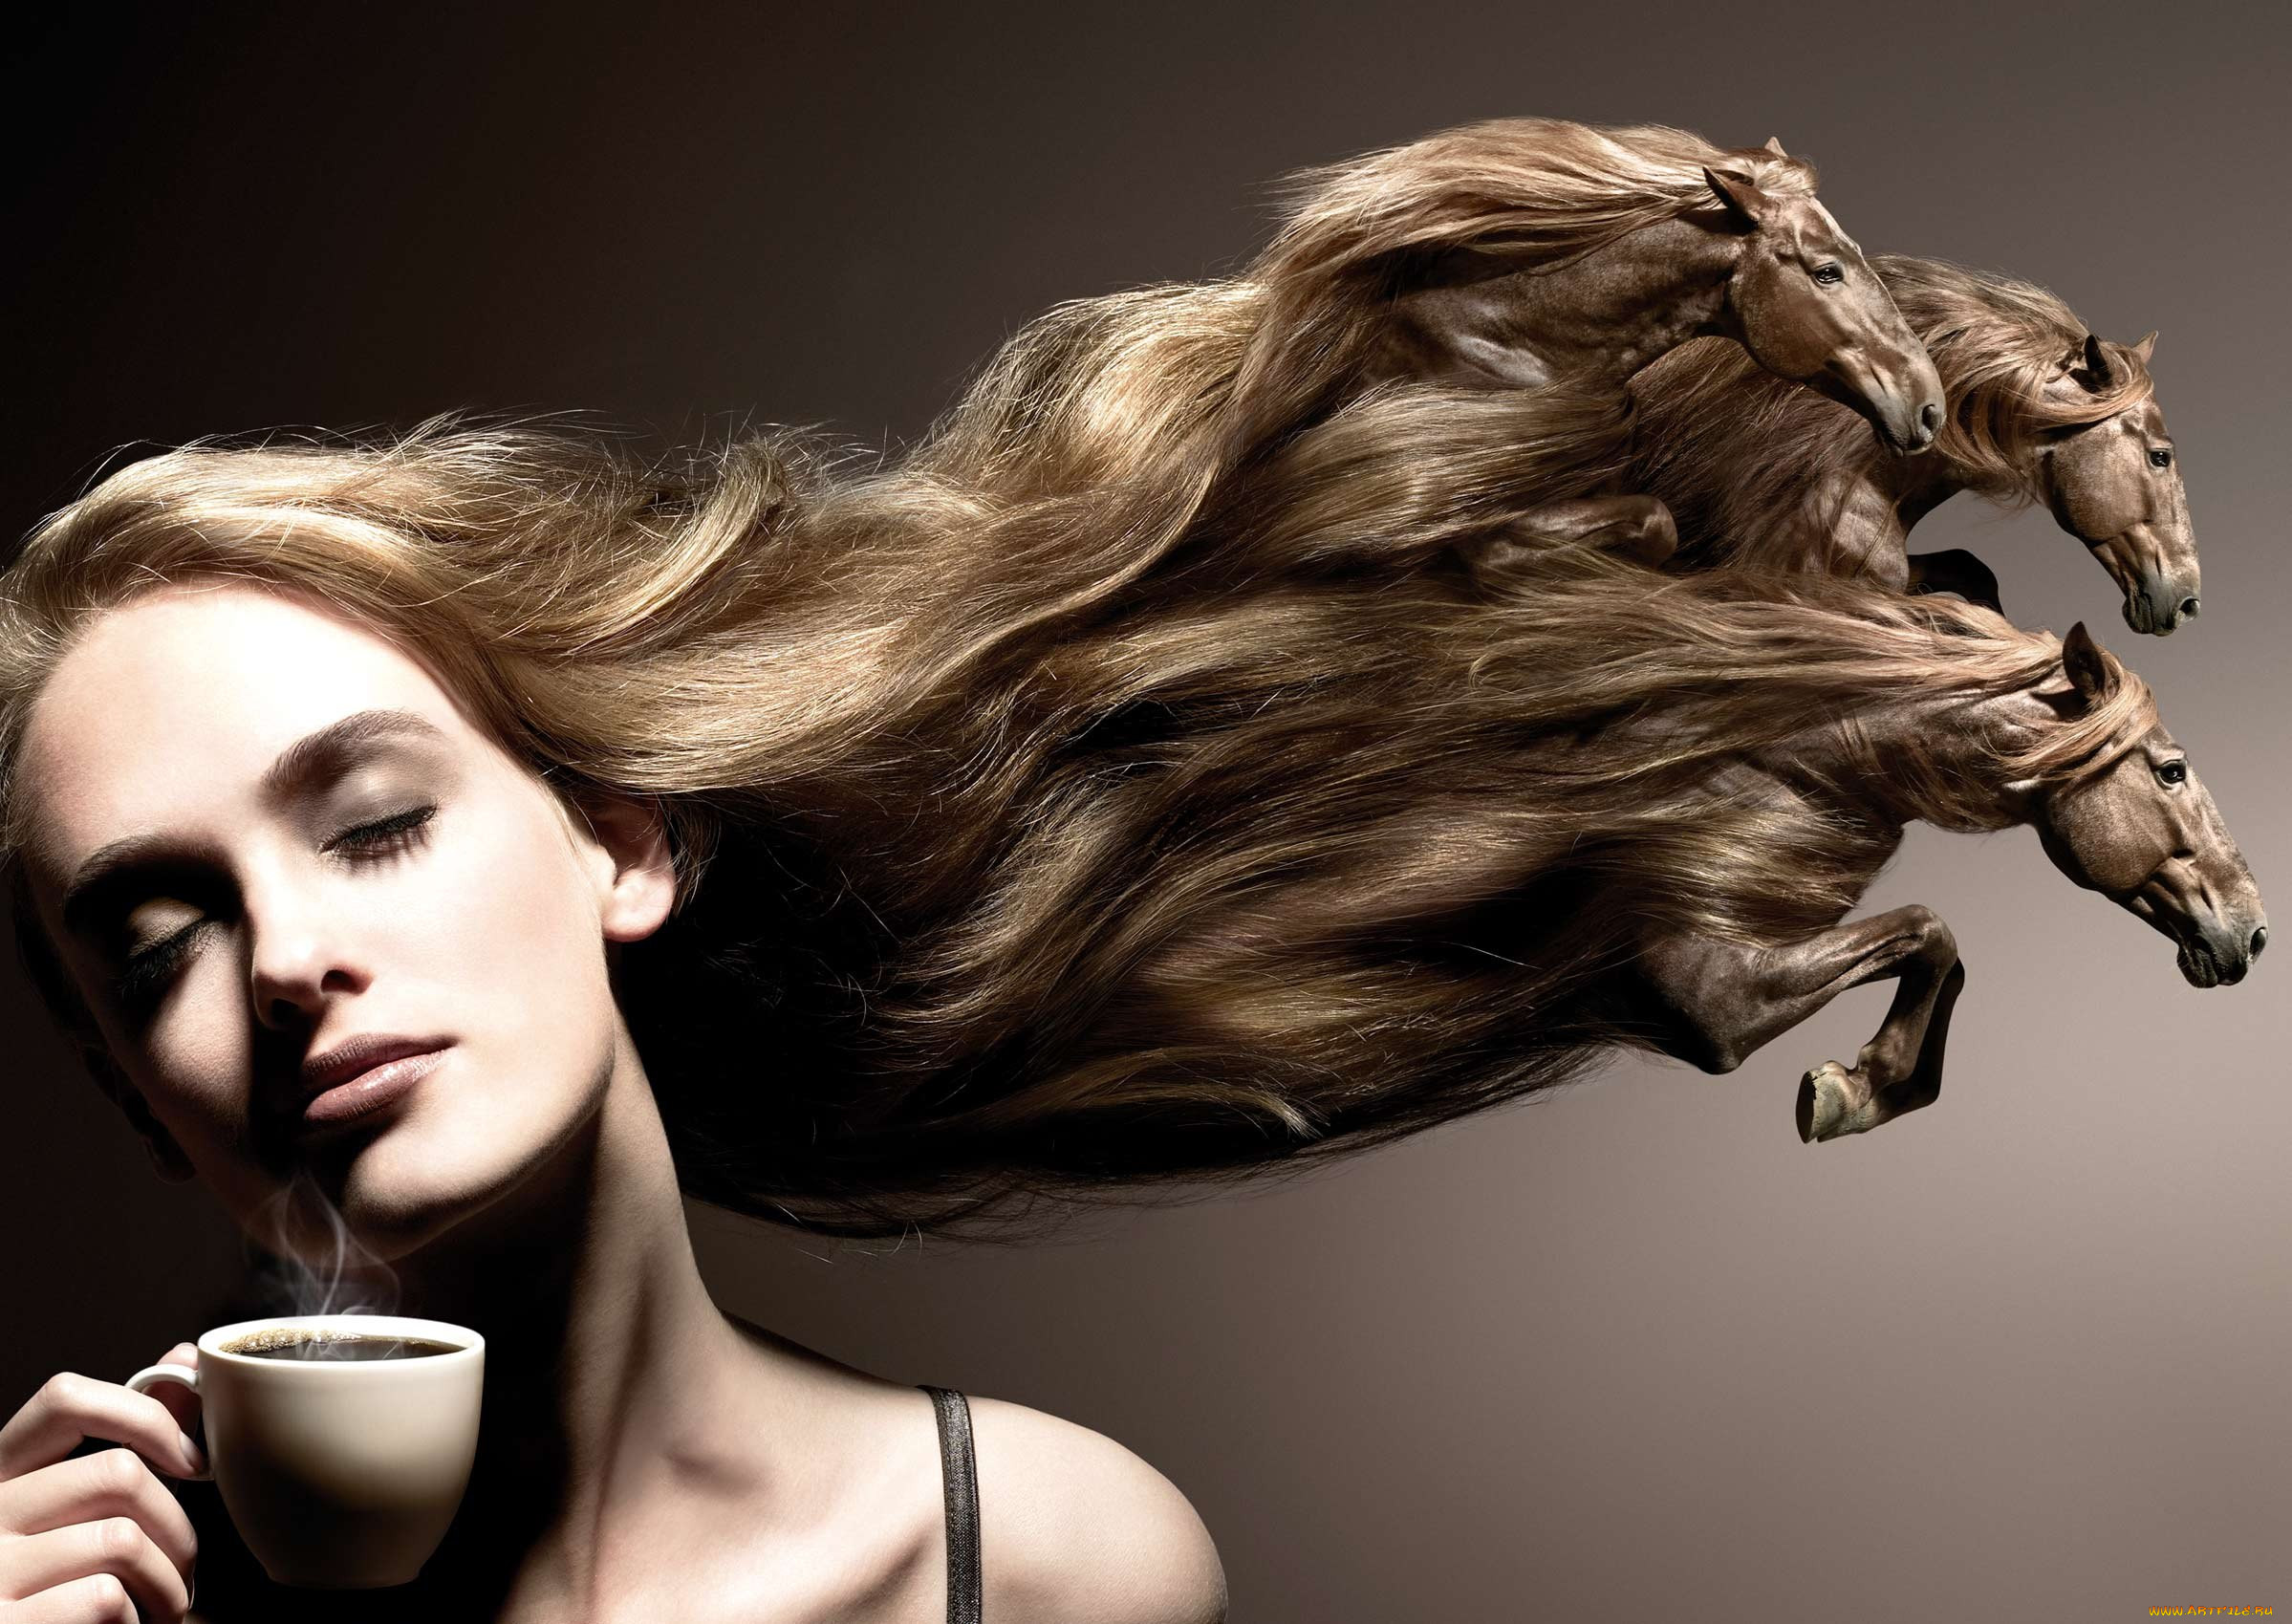 картинки волосы креатив территории есть